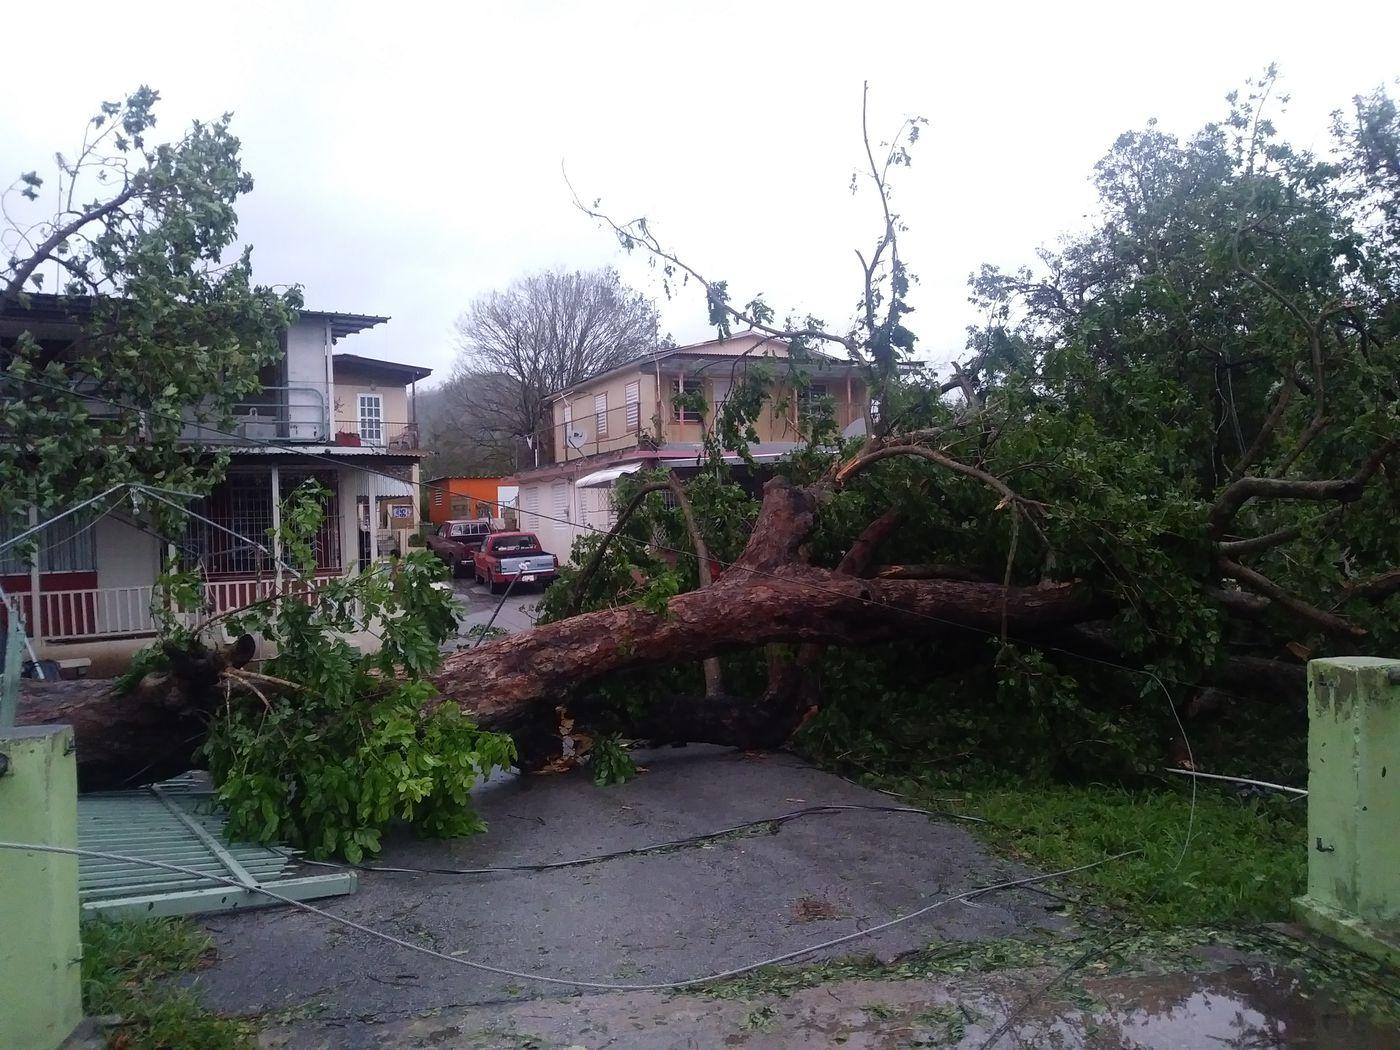 Puerto Rico blackout: 9 months after Maria, thousands still lack